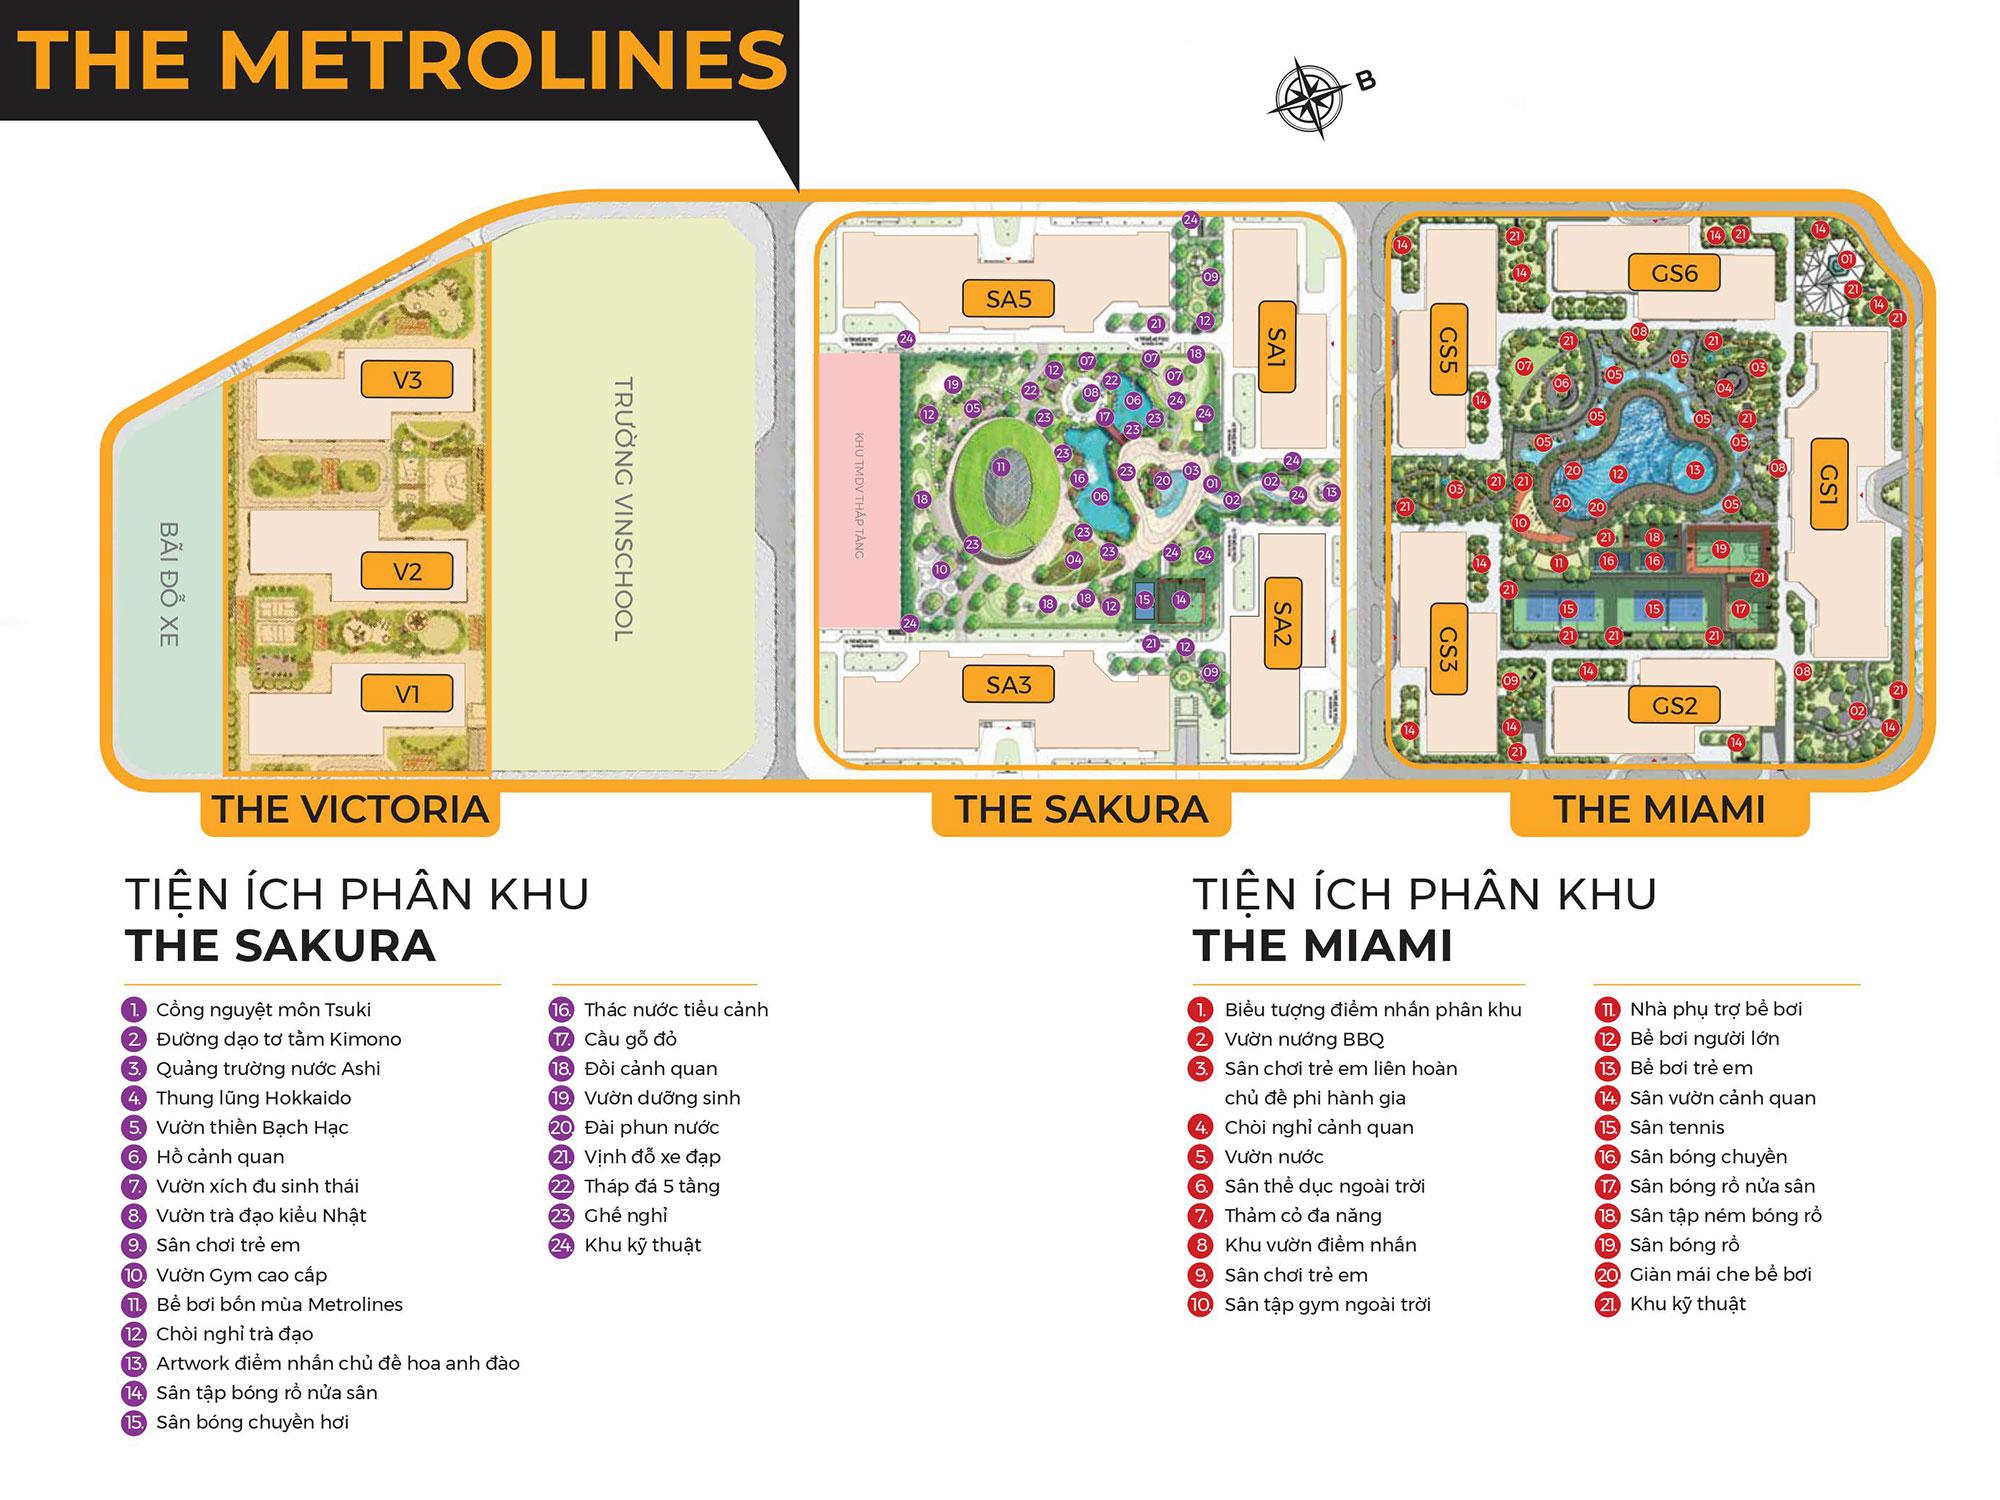 mat-bang-phan-khu-the-metrolines-vinhomes-smart-city